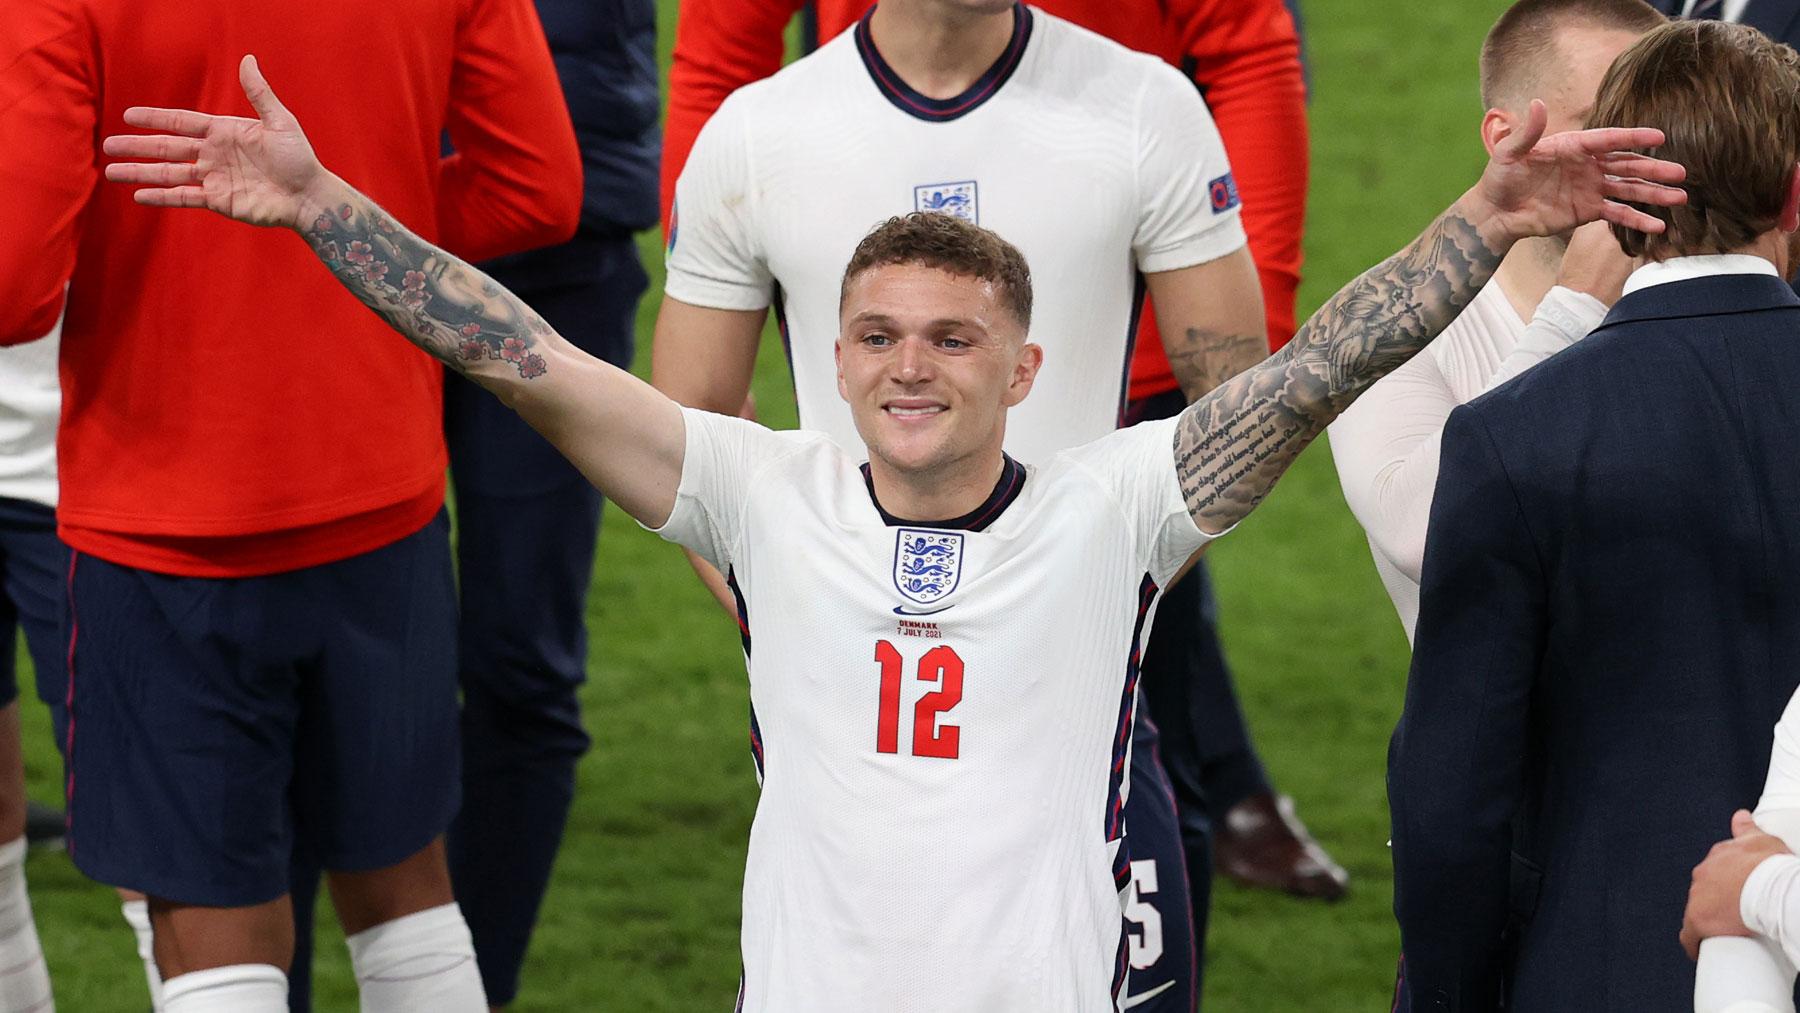 Trippier celebra el pase de Inglaterra a la final de la Eurocopa 2020 (Getty)